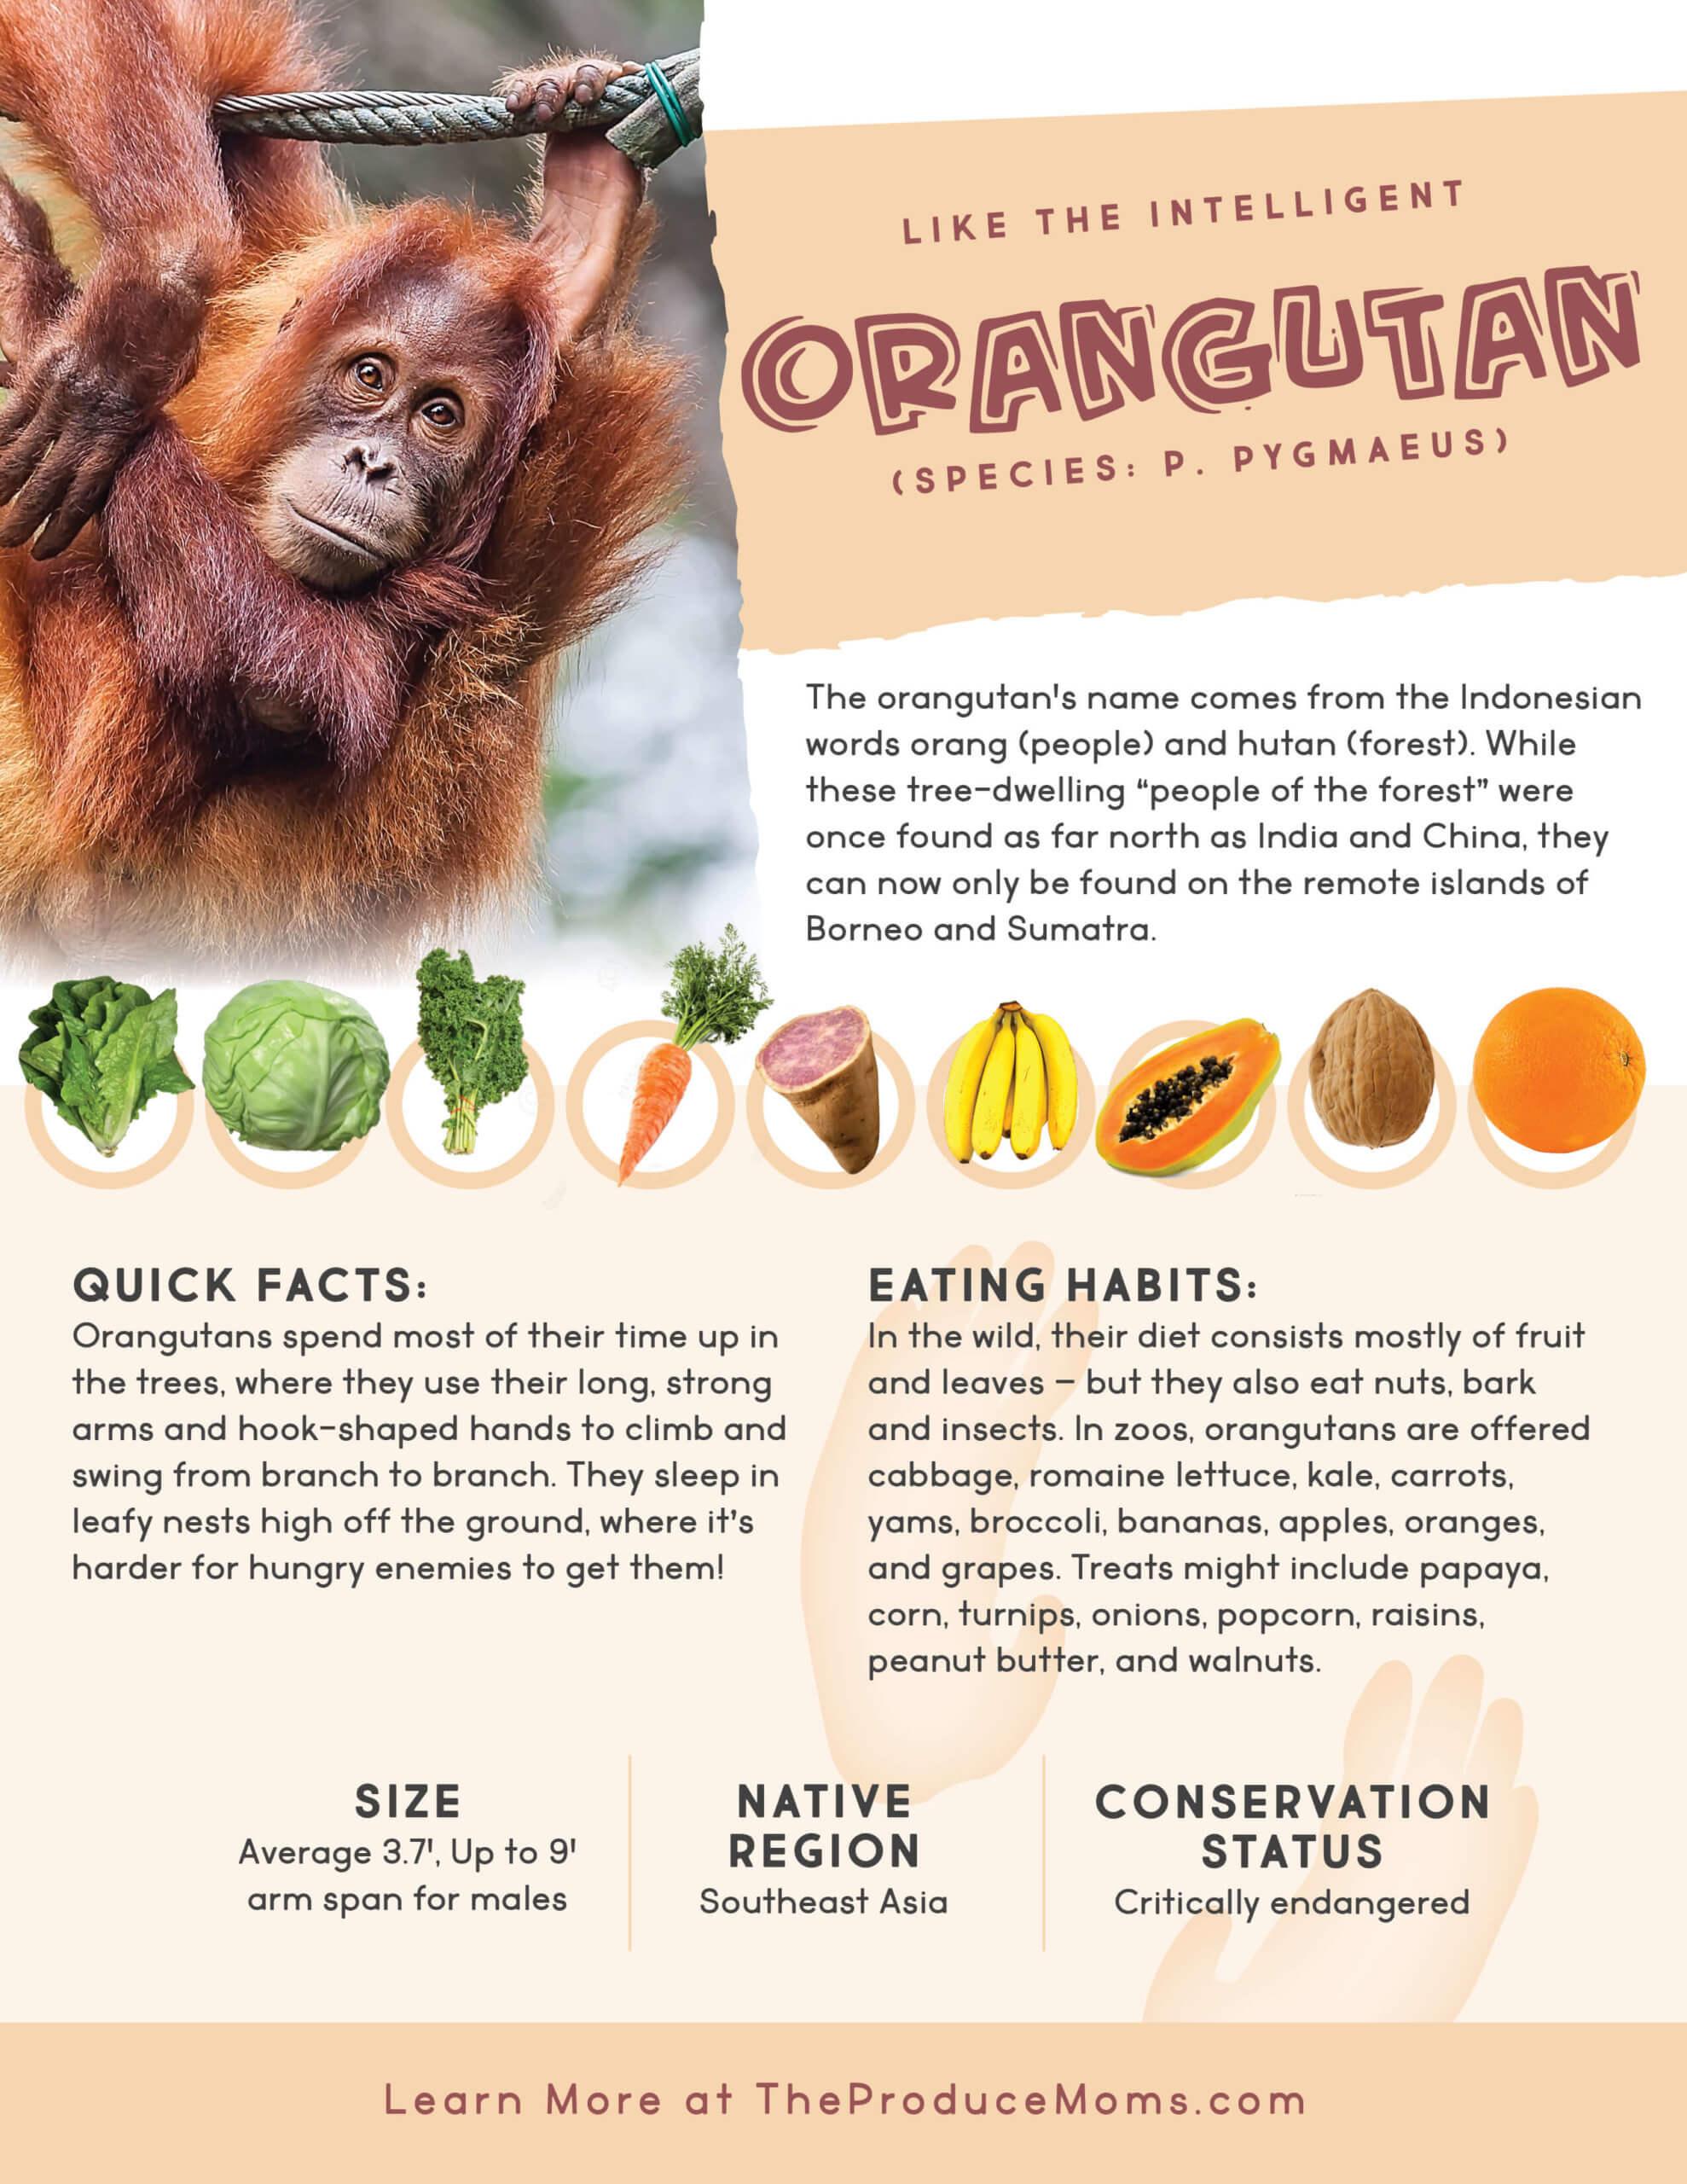 Orangutan diet and facts